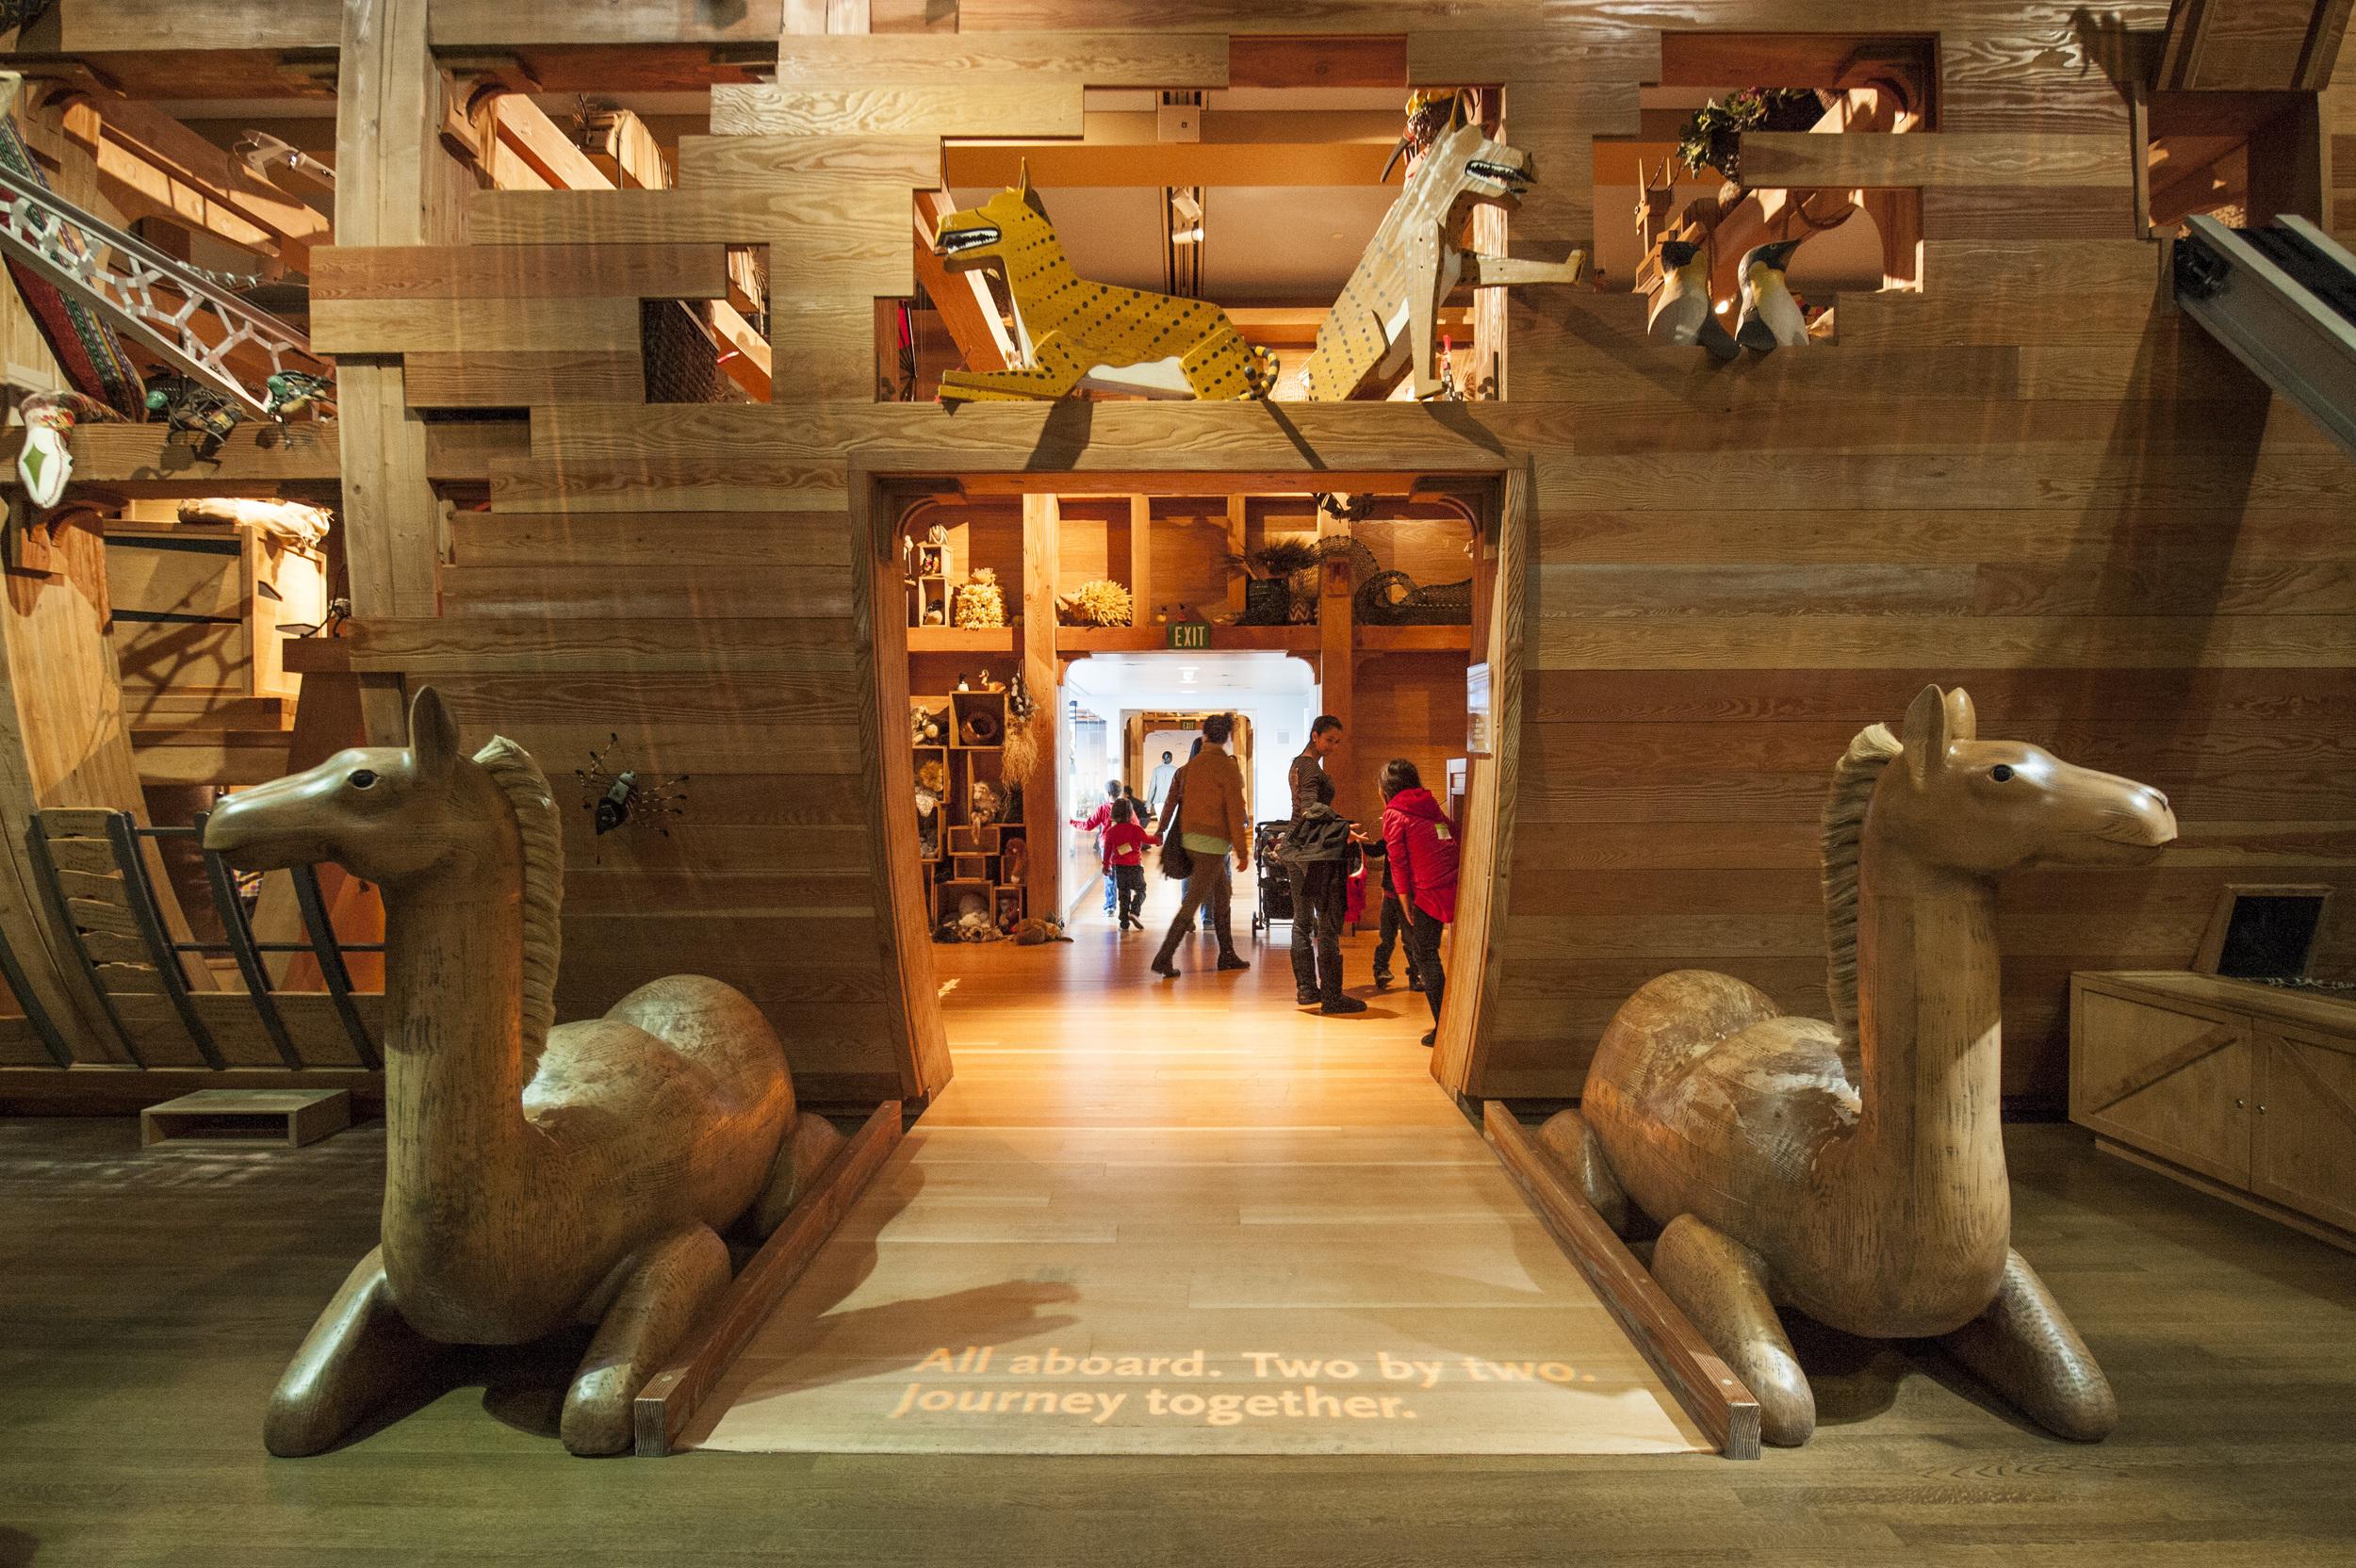 7/Noah's Ark at Skirball Cultural Center